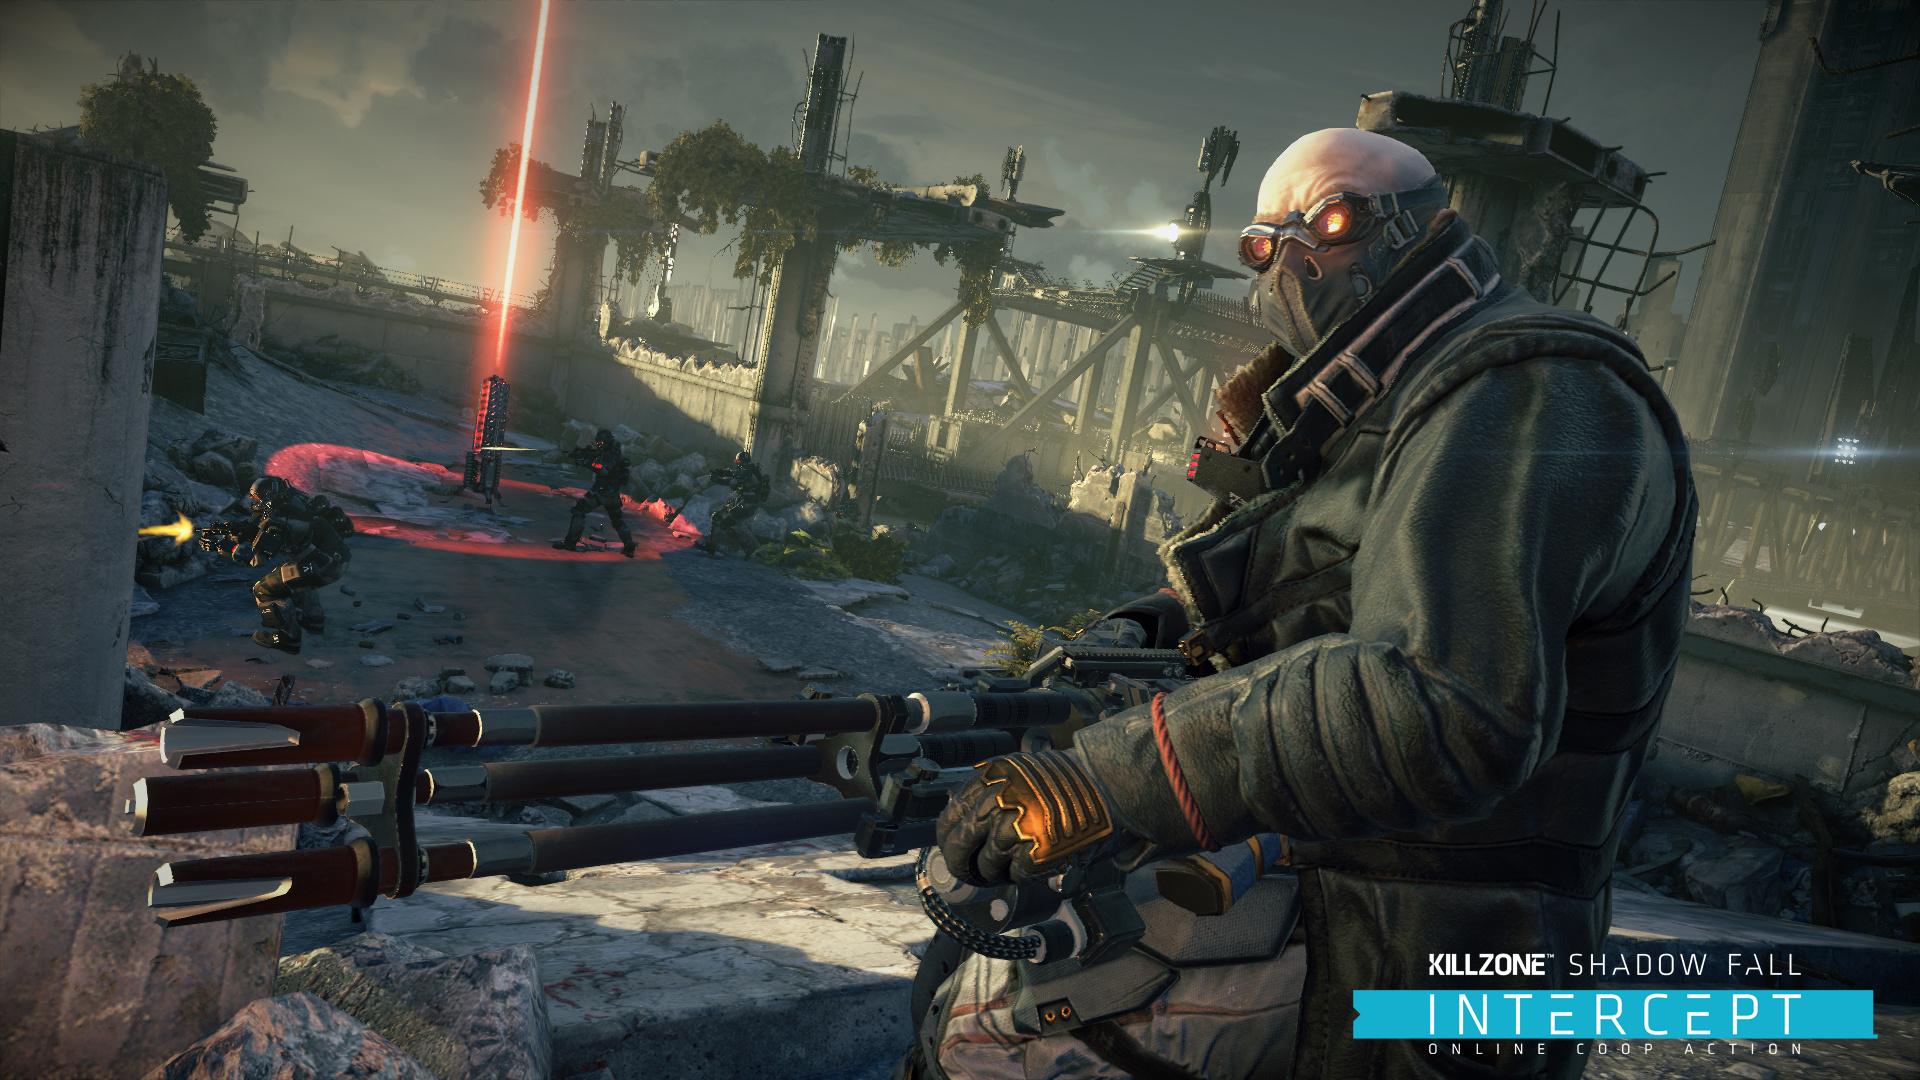 Killzone: Shadow Fall - Intercept Review (PS4) | Push Square  Killzone 4 Review